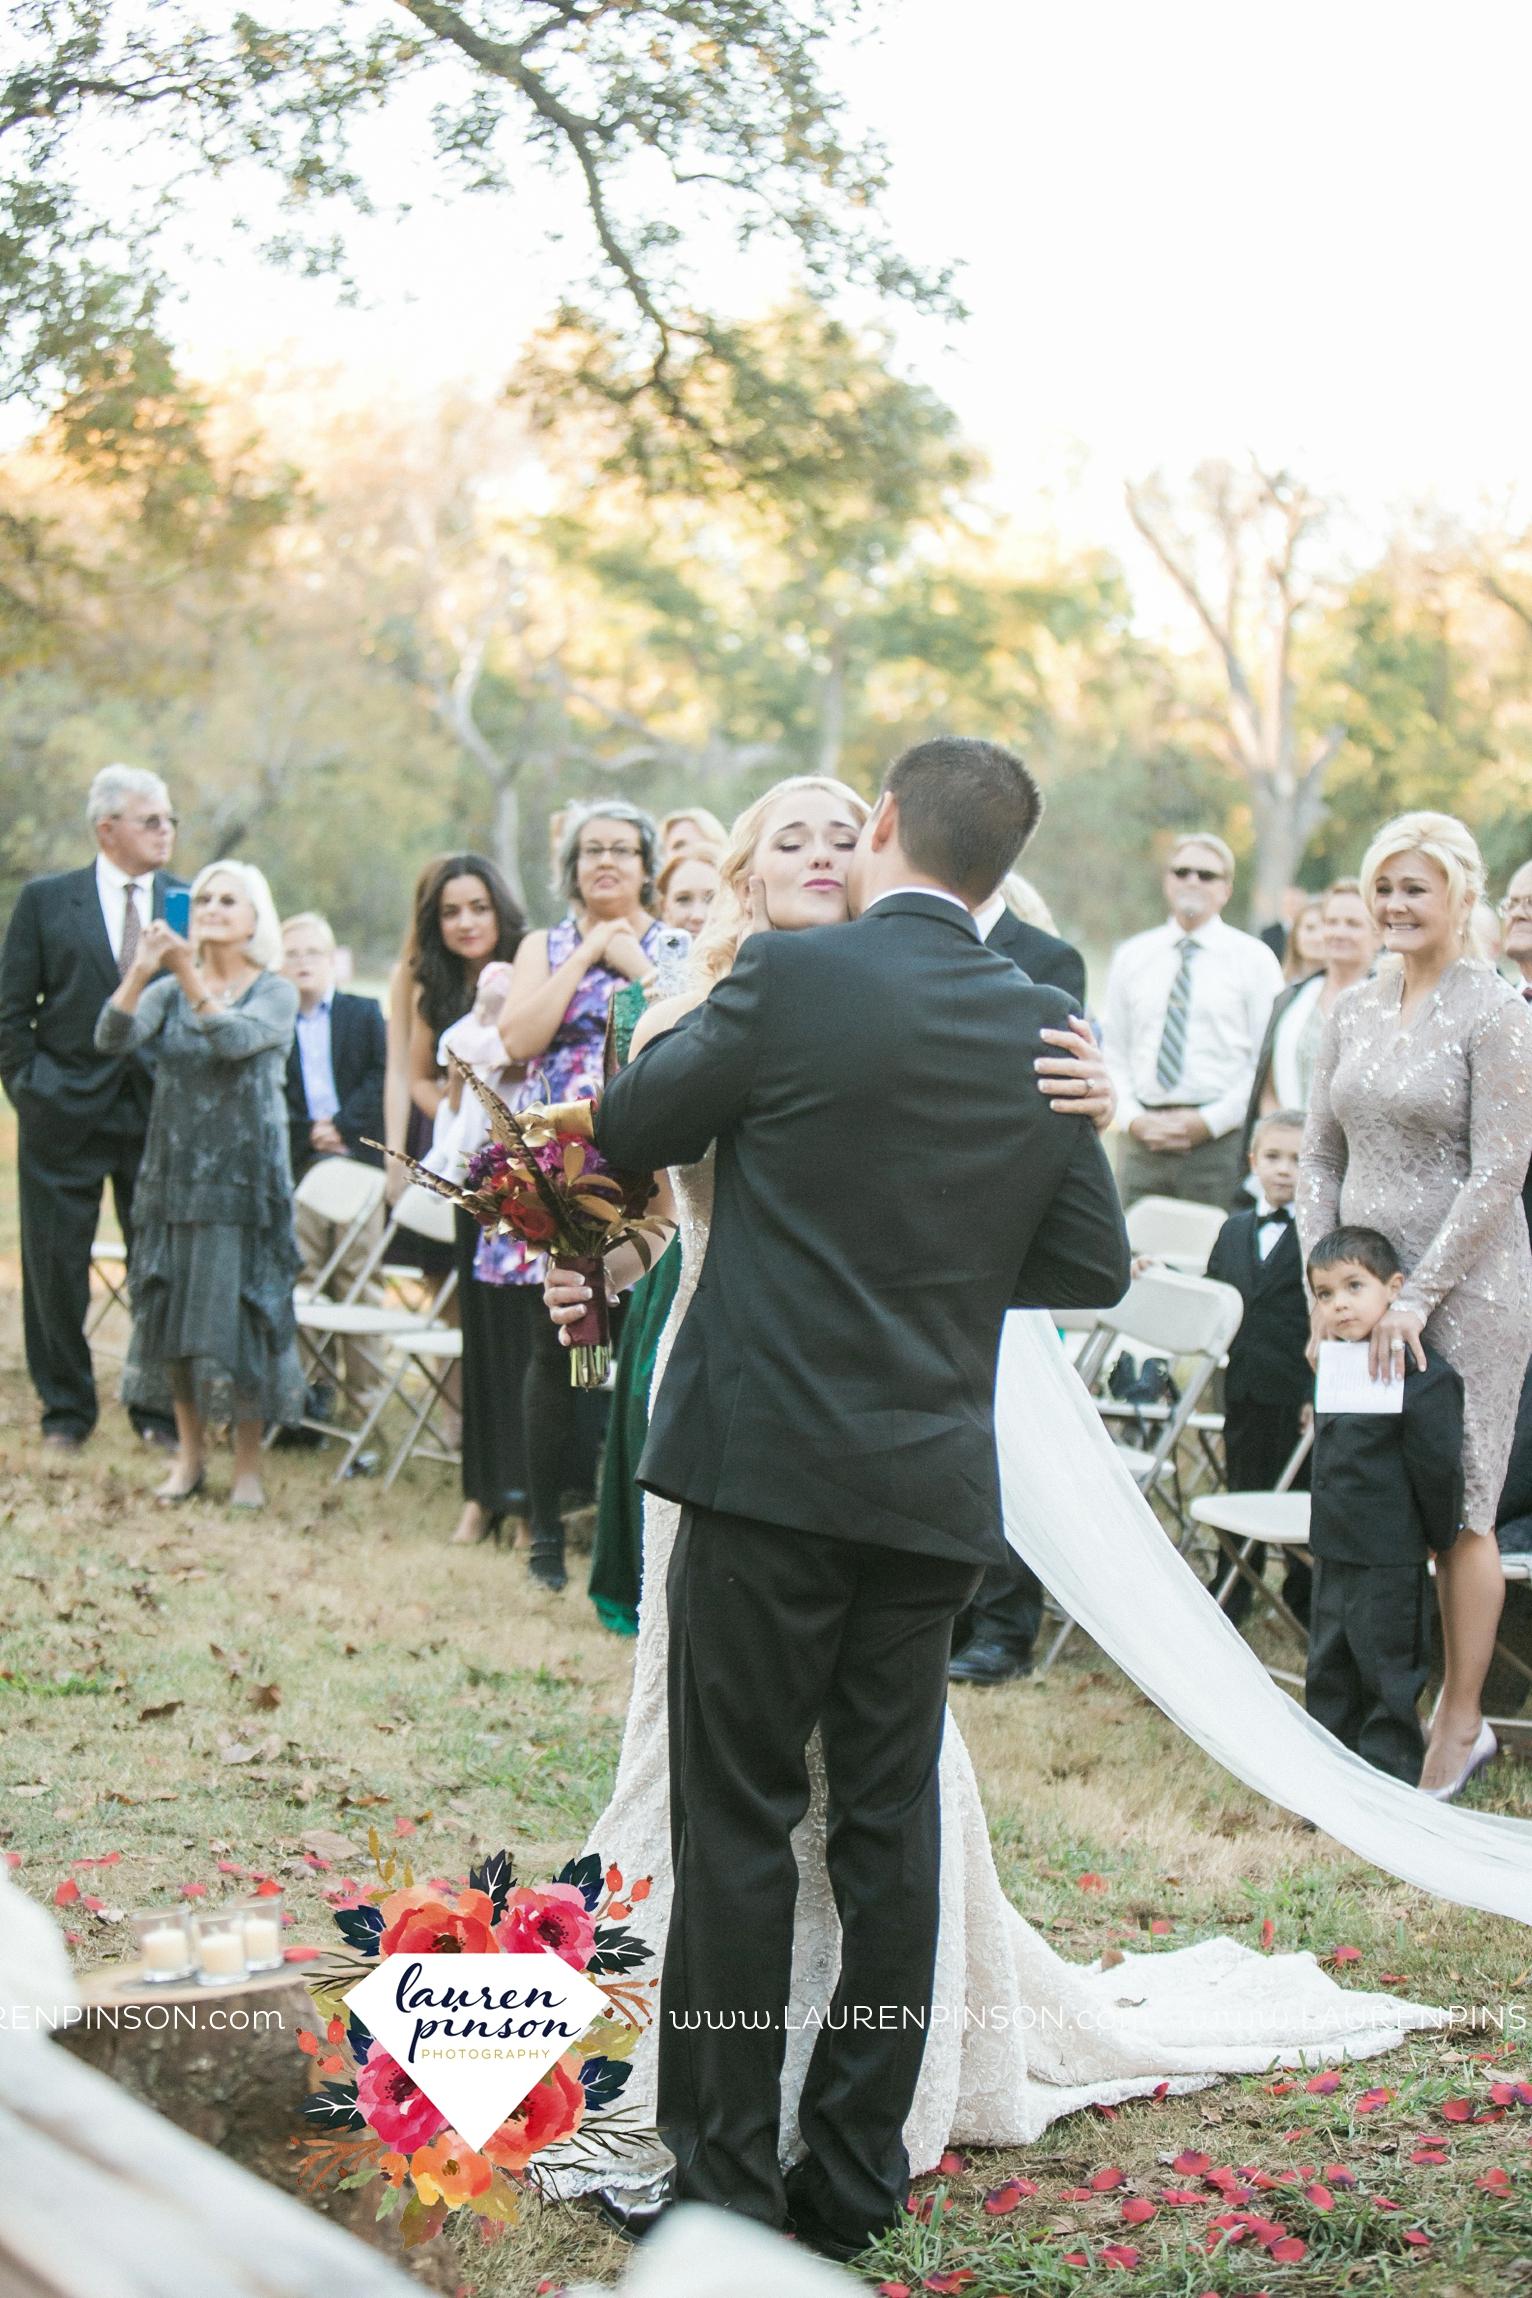 rustic-wichita-falls-texas-wedding-photographer-gold-glam-mayfield-events-market-street-united-allue-bridals-fall_1679.jpg